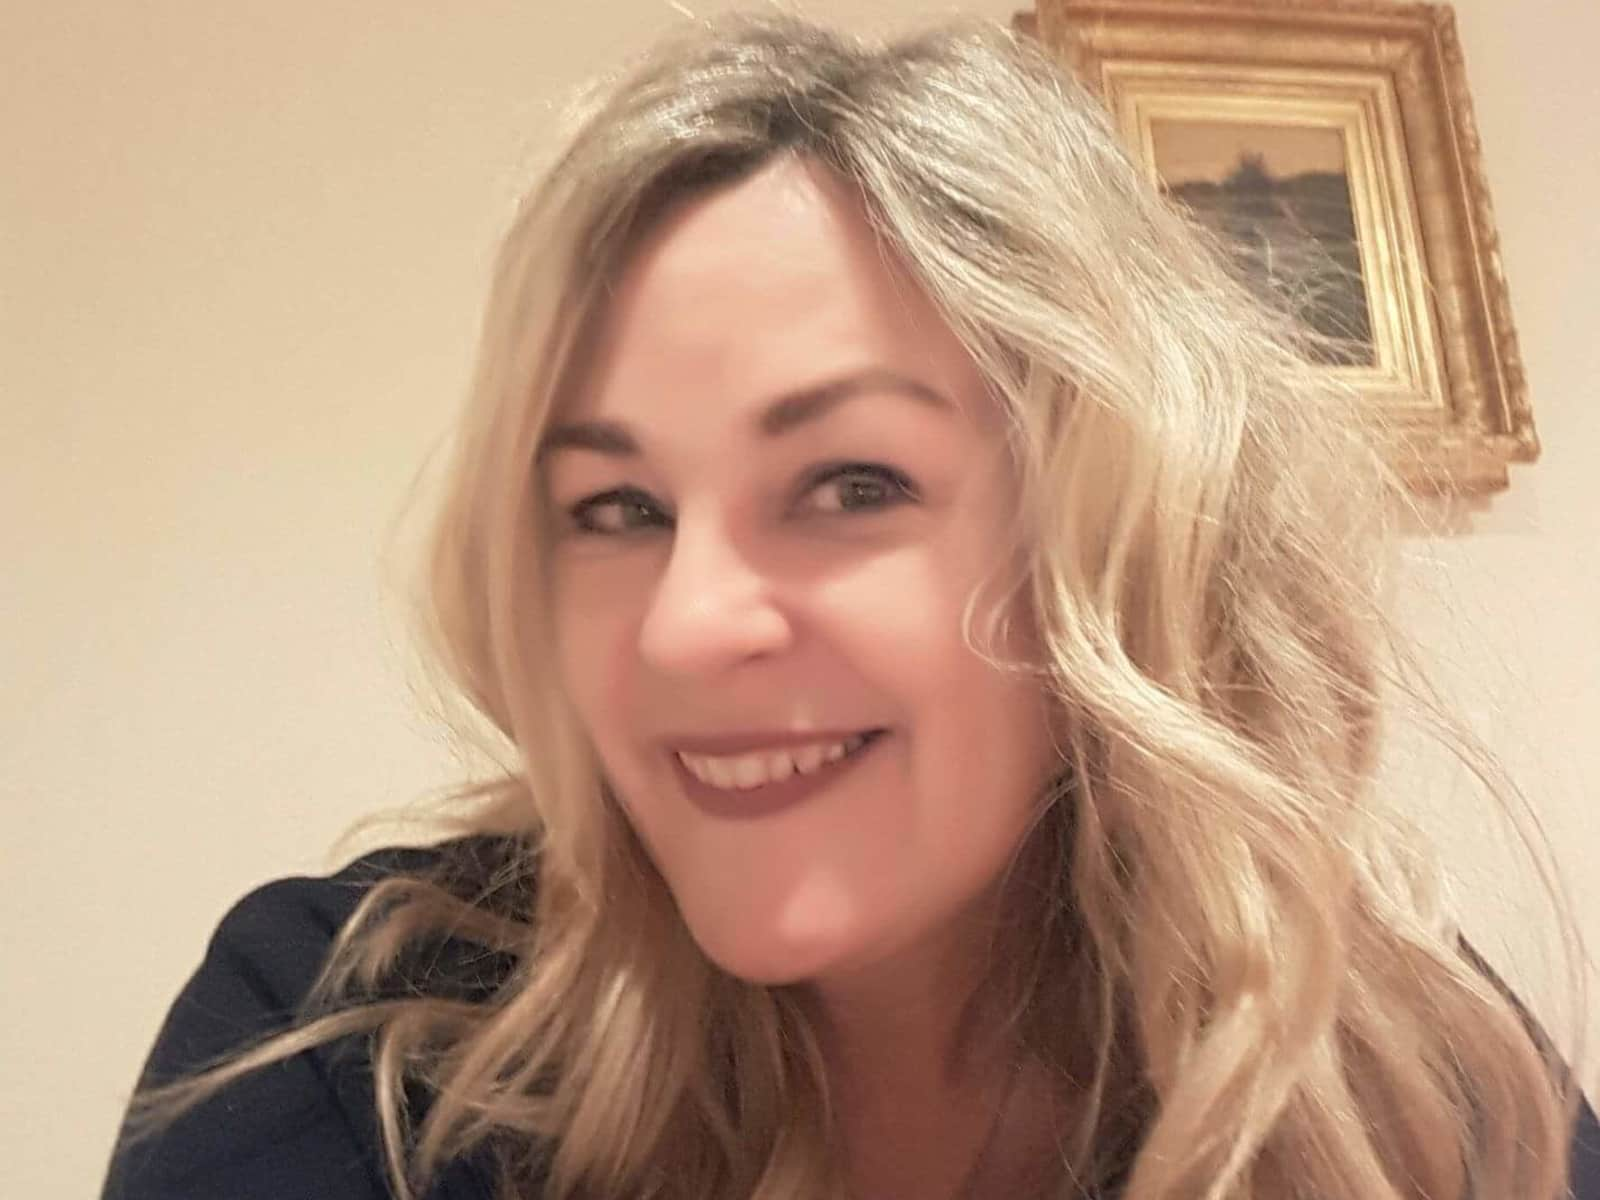 Adele from London, United Kingdom